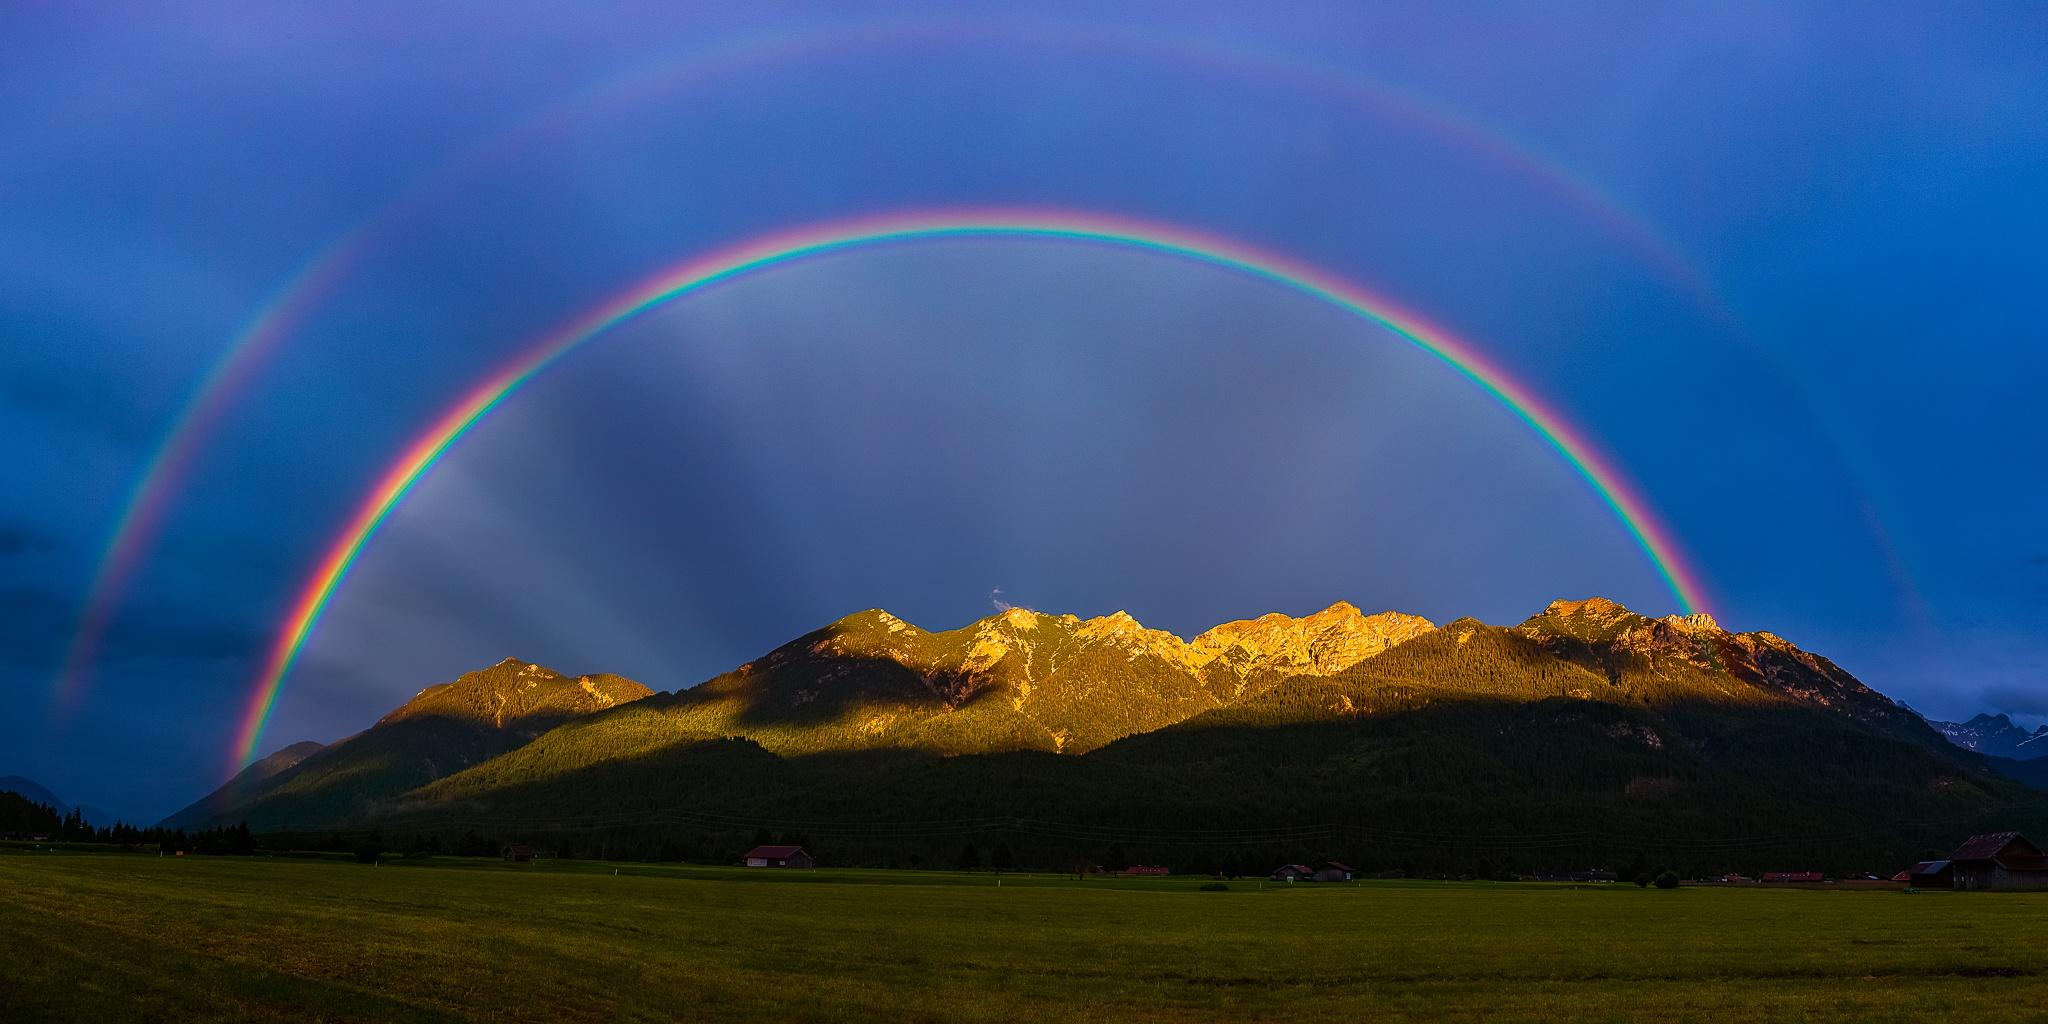 Doppelter-Regenbogen